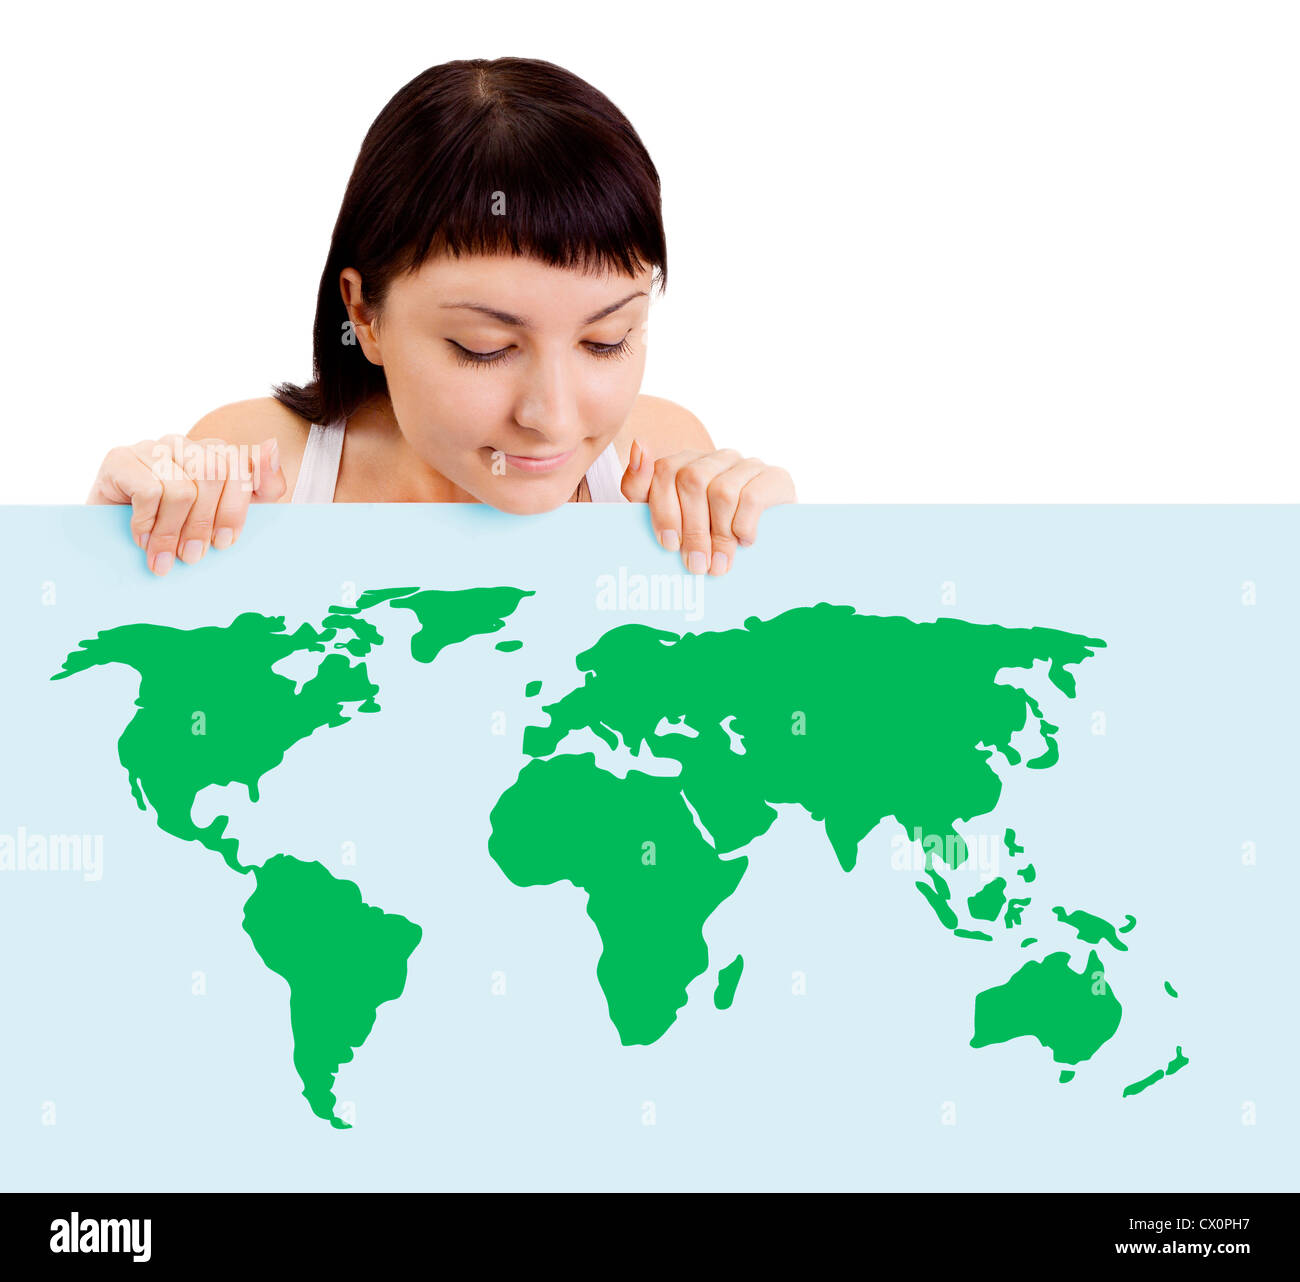 Woman smiling showing earth globe on billboard - Stock Image